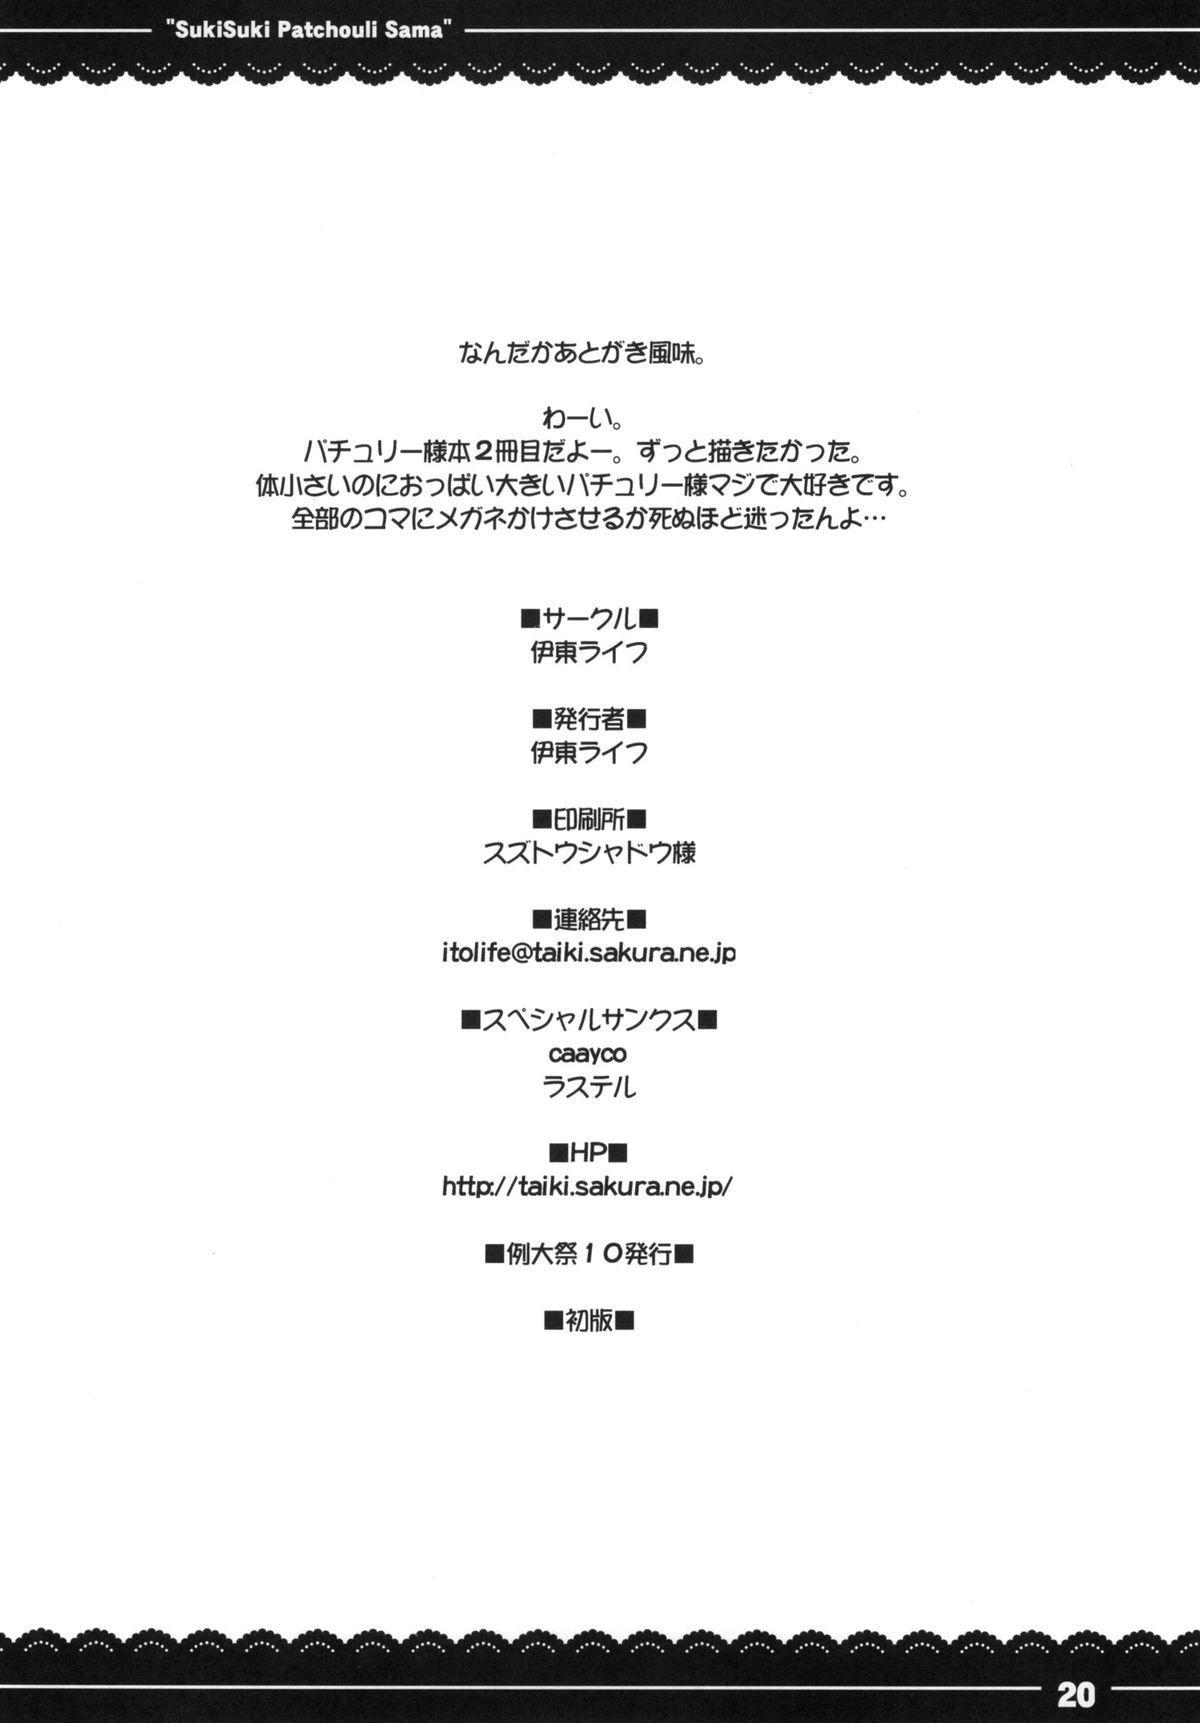 (Reitaisai 10) [Itou Life] Suki Suki! Patchouli-sama | I Really Like You! Patchouli-sama (Touhou Project) [English] {doujin-moe.us} 20